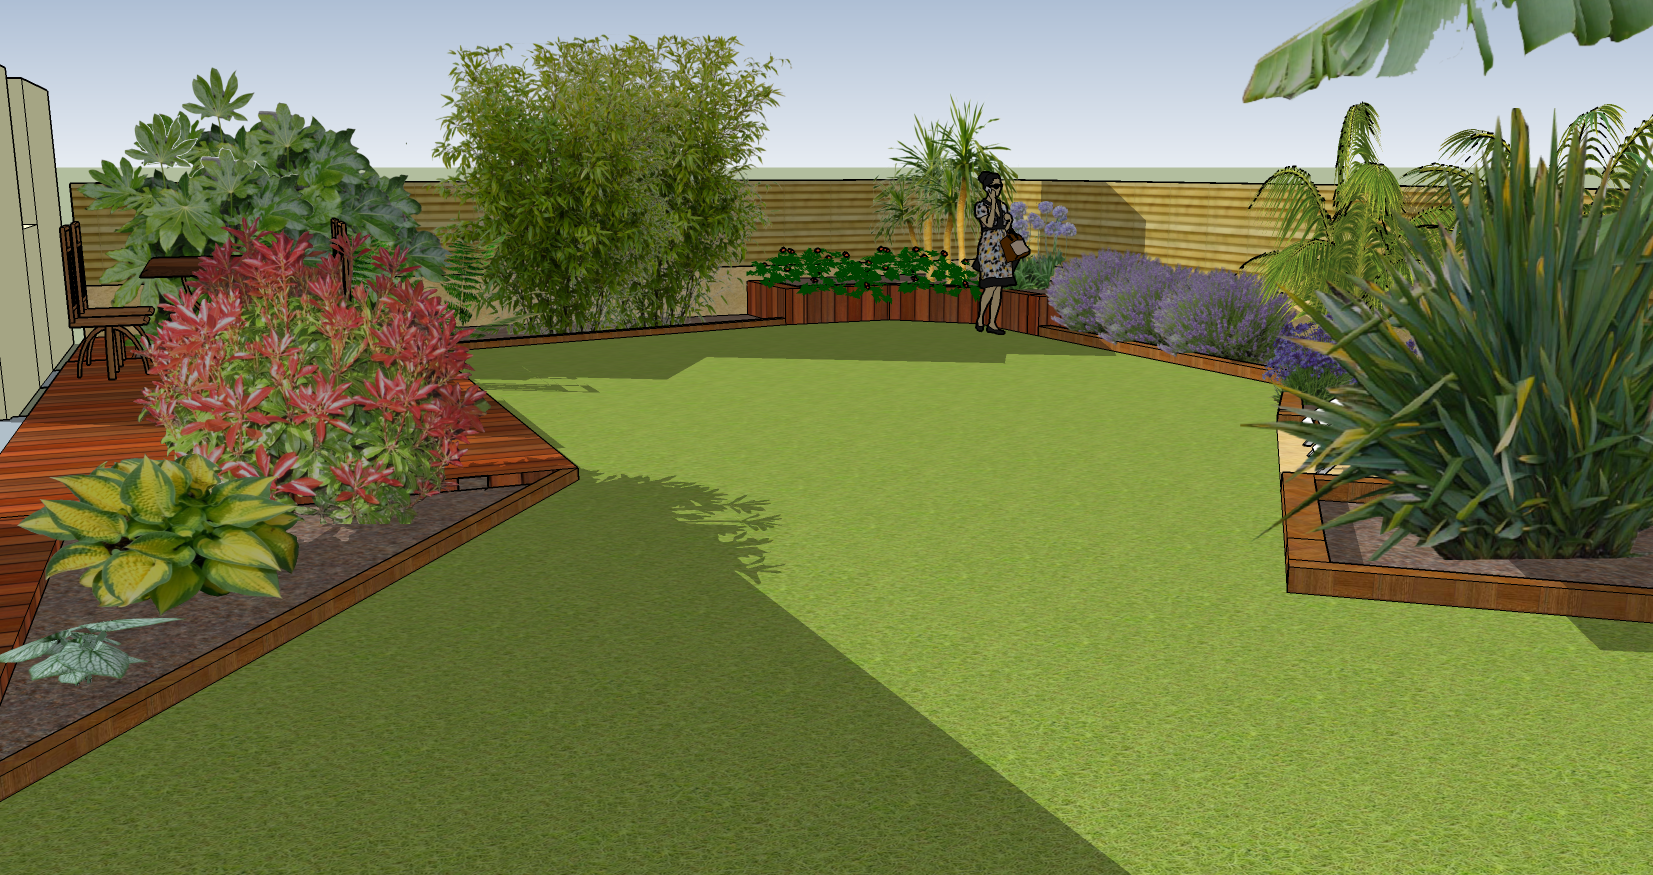 jardin 3d fabulous logiciel jardin d logiciel jardin d bargain paysage conception du plan de. Black Bedroom Furniture Sets. Home Design Ideas